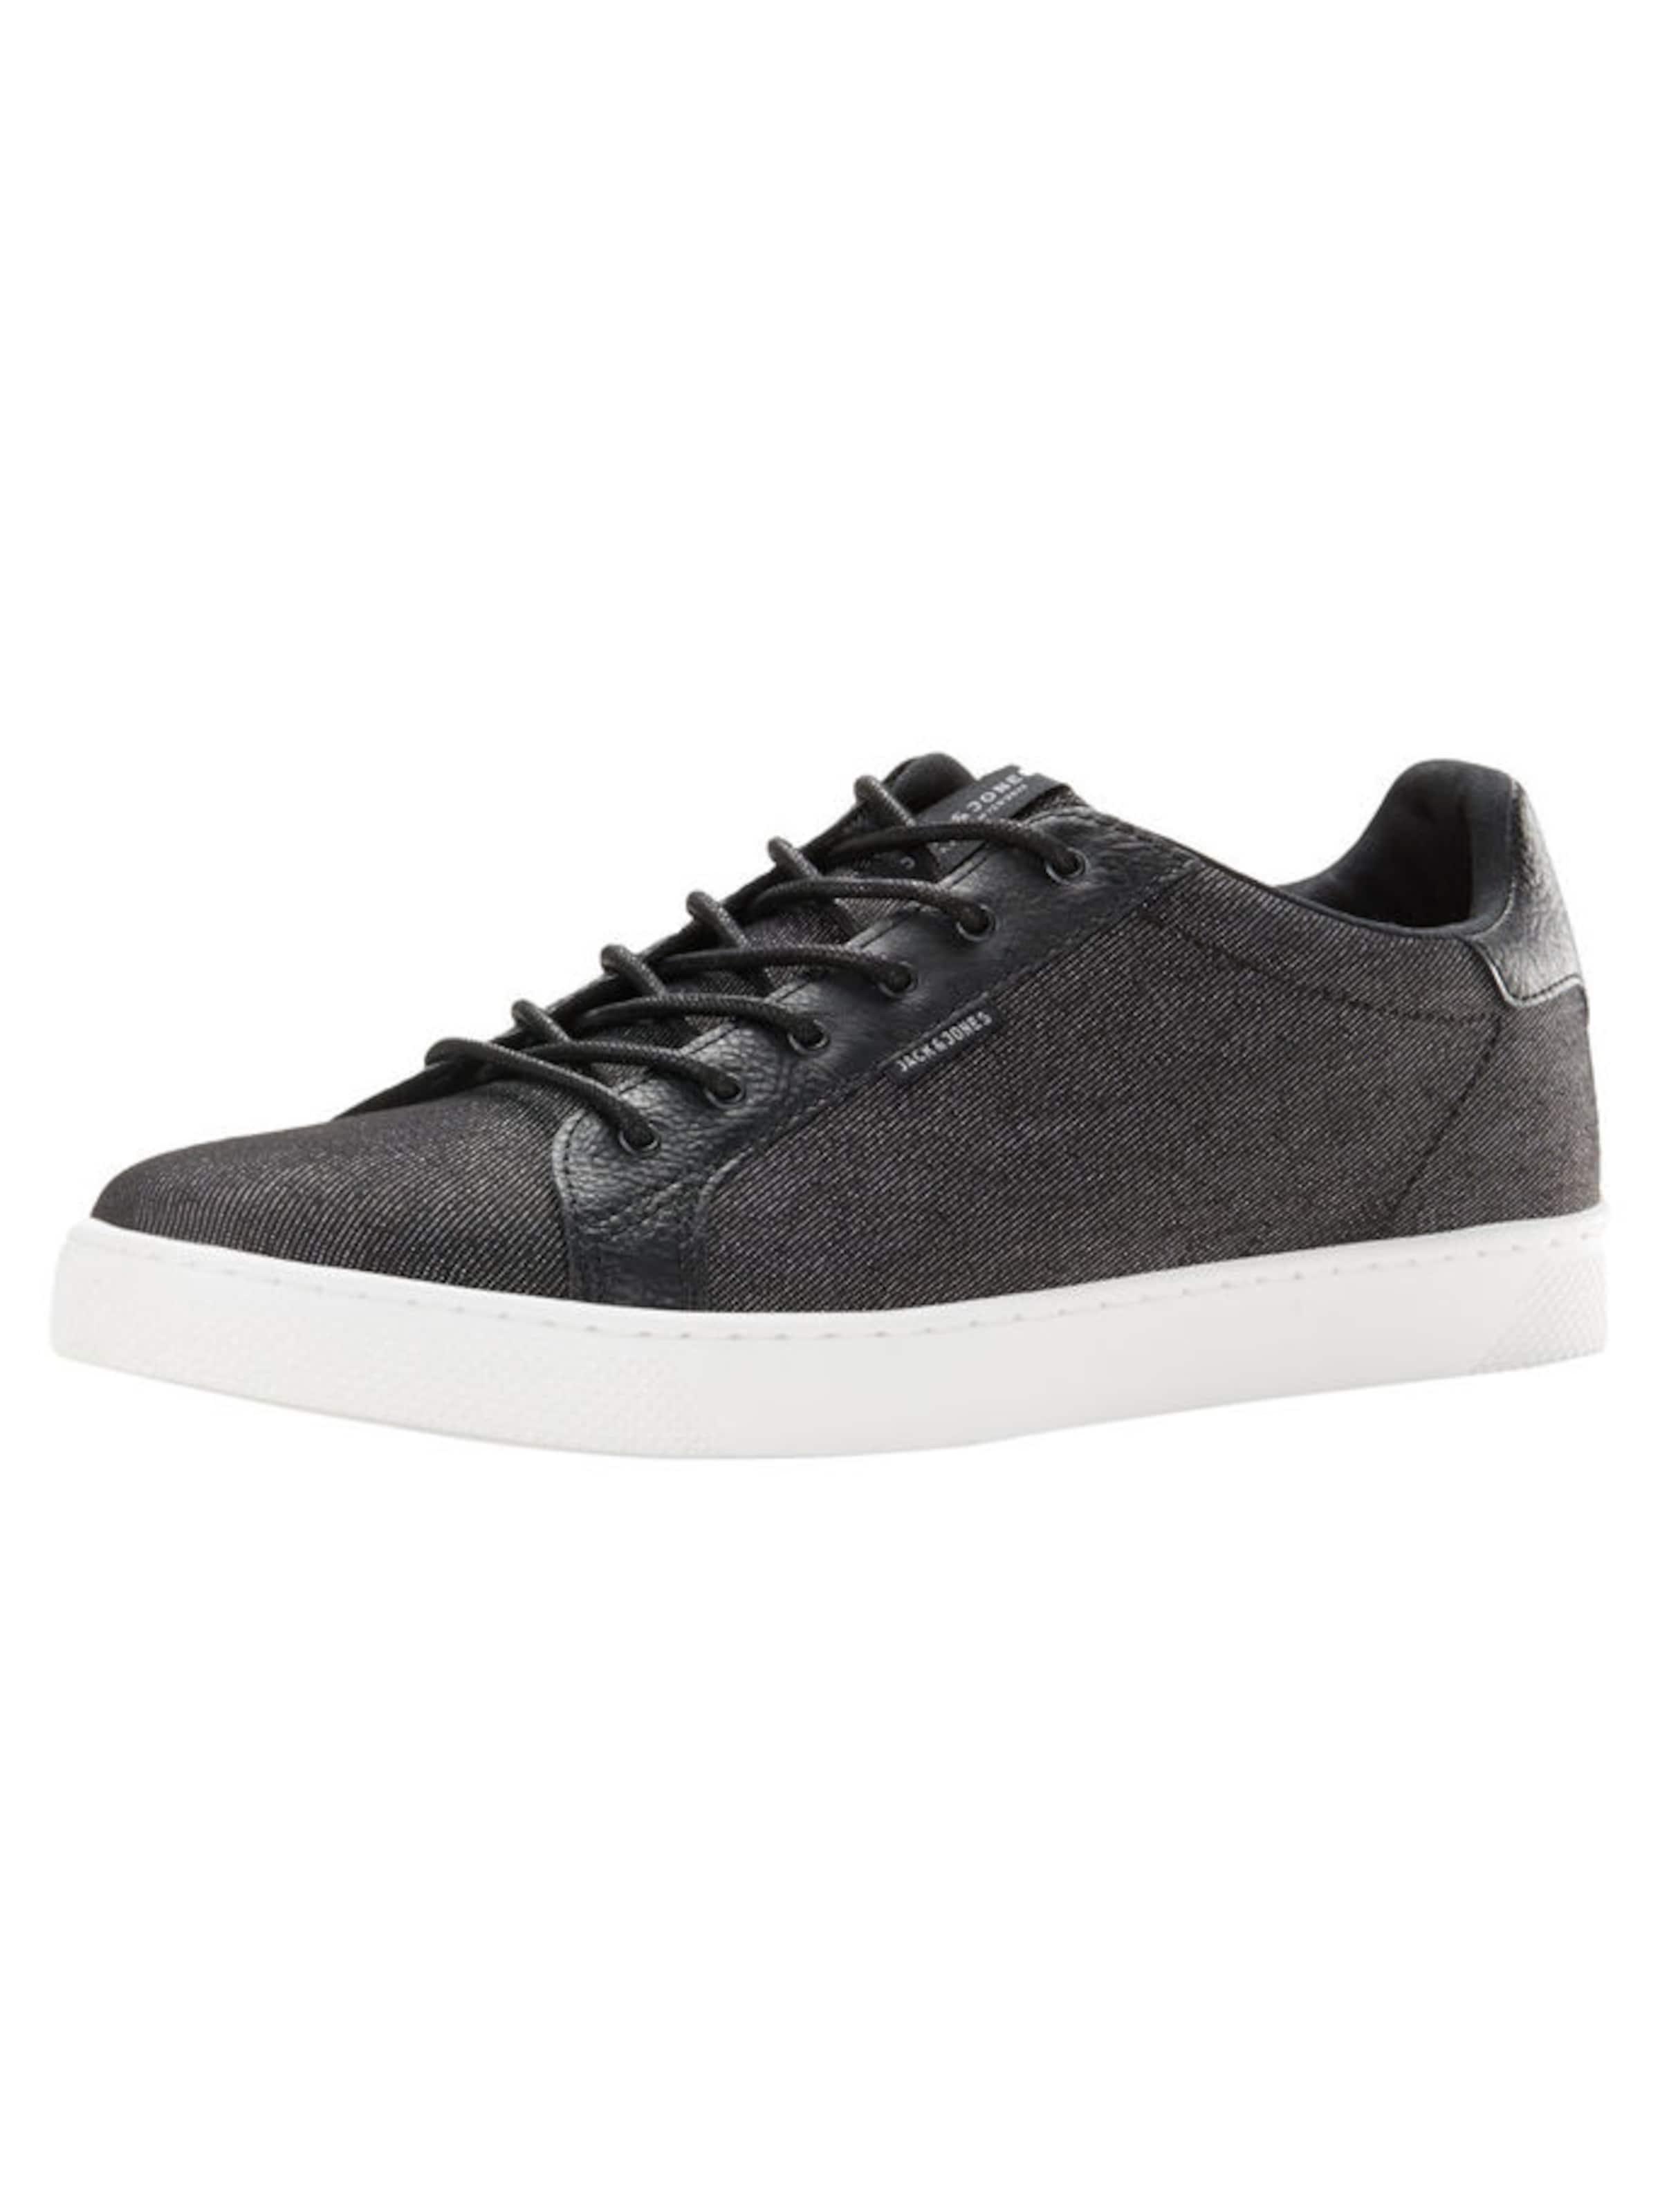 JACK & JONES | Jeans Combo Sneaker